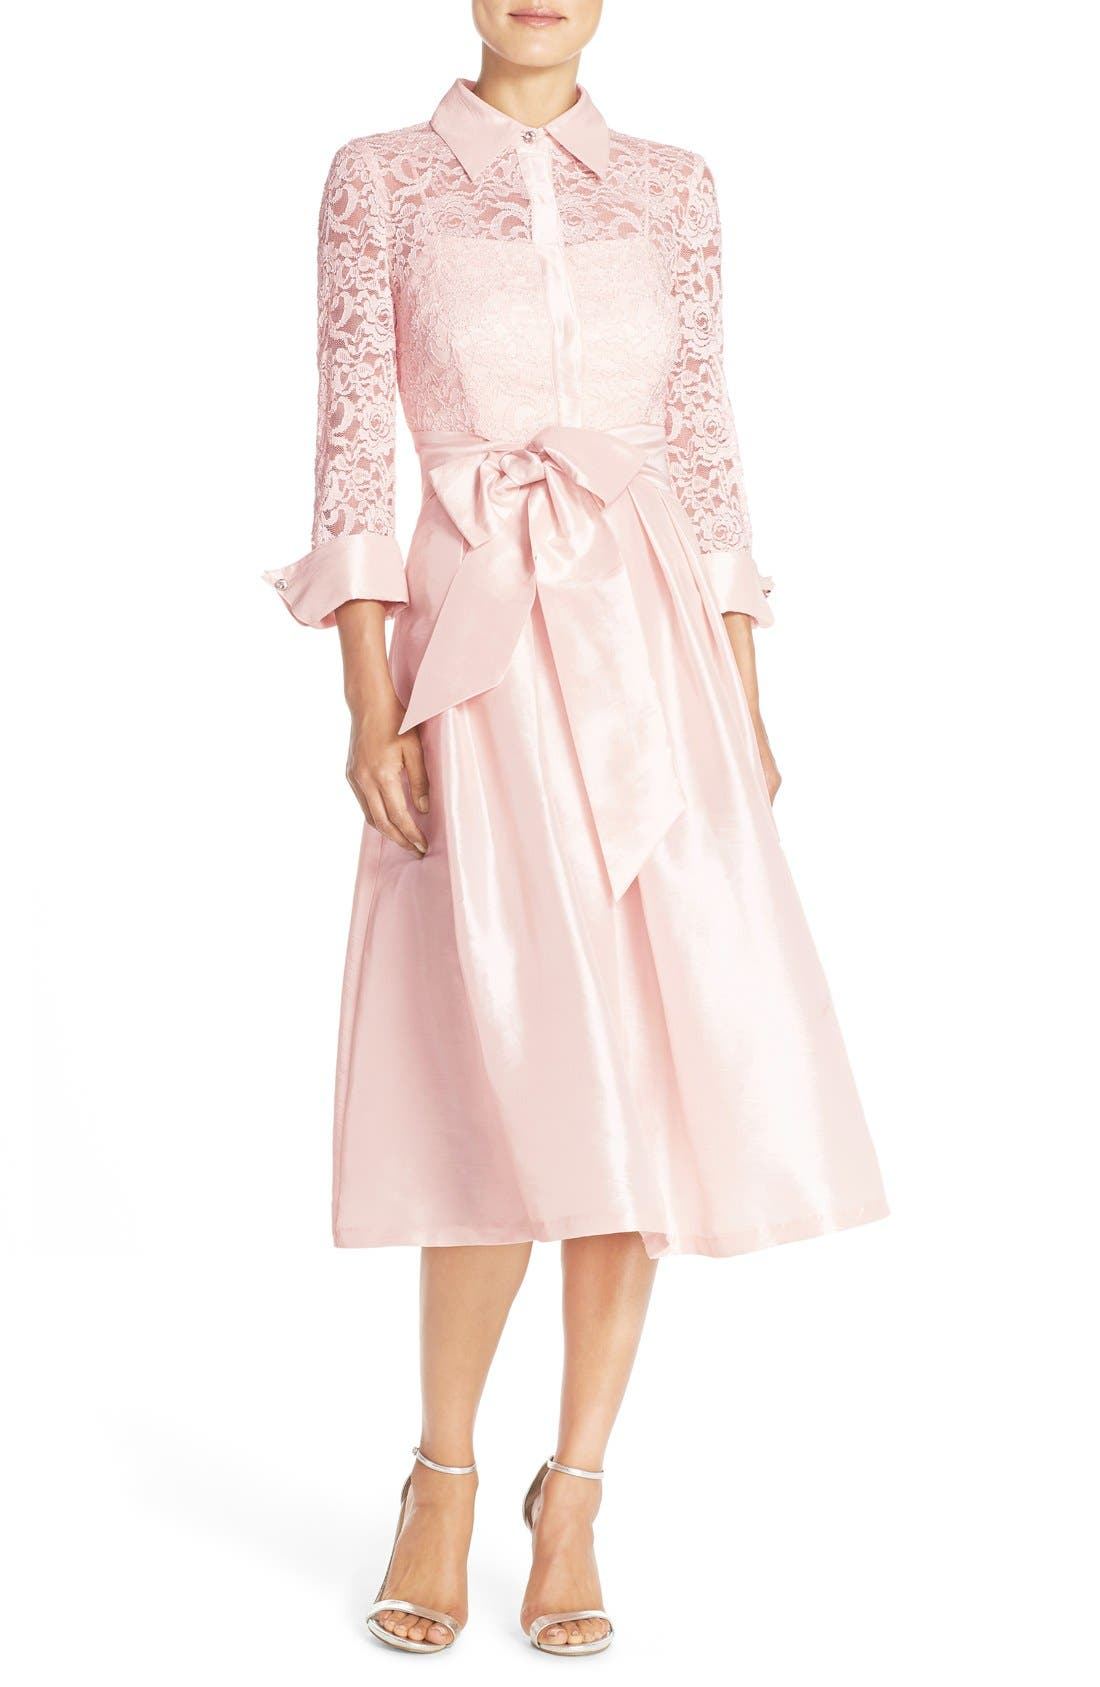 Main Image - Eliza J Belted Lace & Taffeta Point Collar Midi Dress (Regular & Petite)